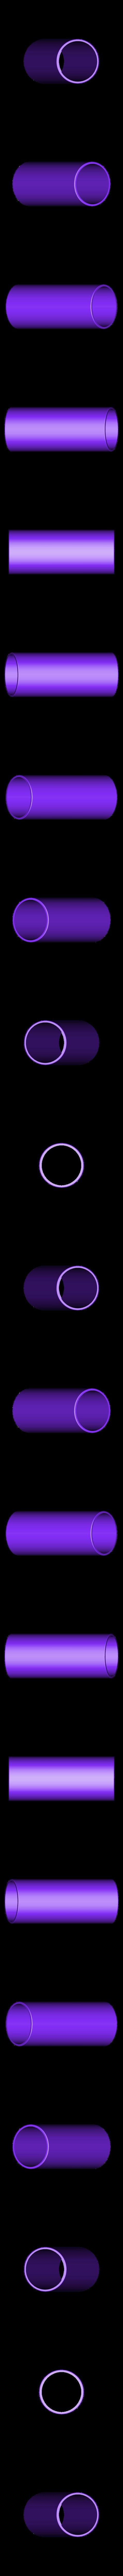 cylinder.stl Download free STL file Foam Dart GUN (pullback loading) • 3D print design, senns